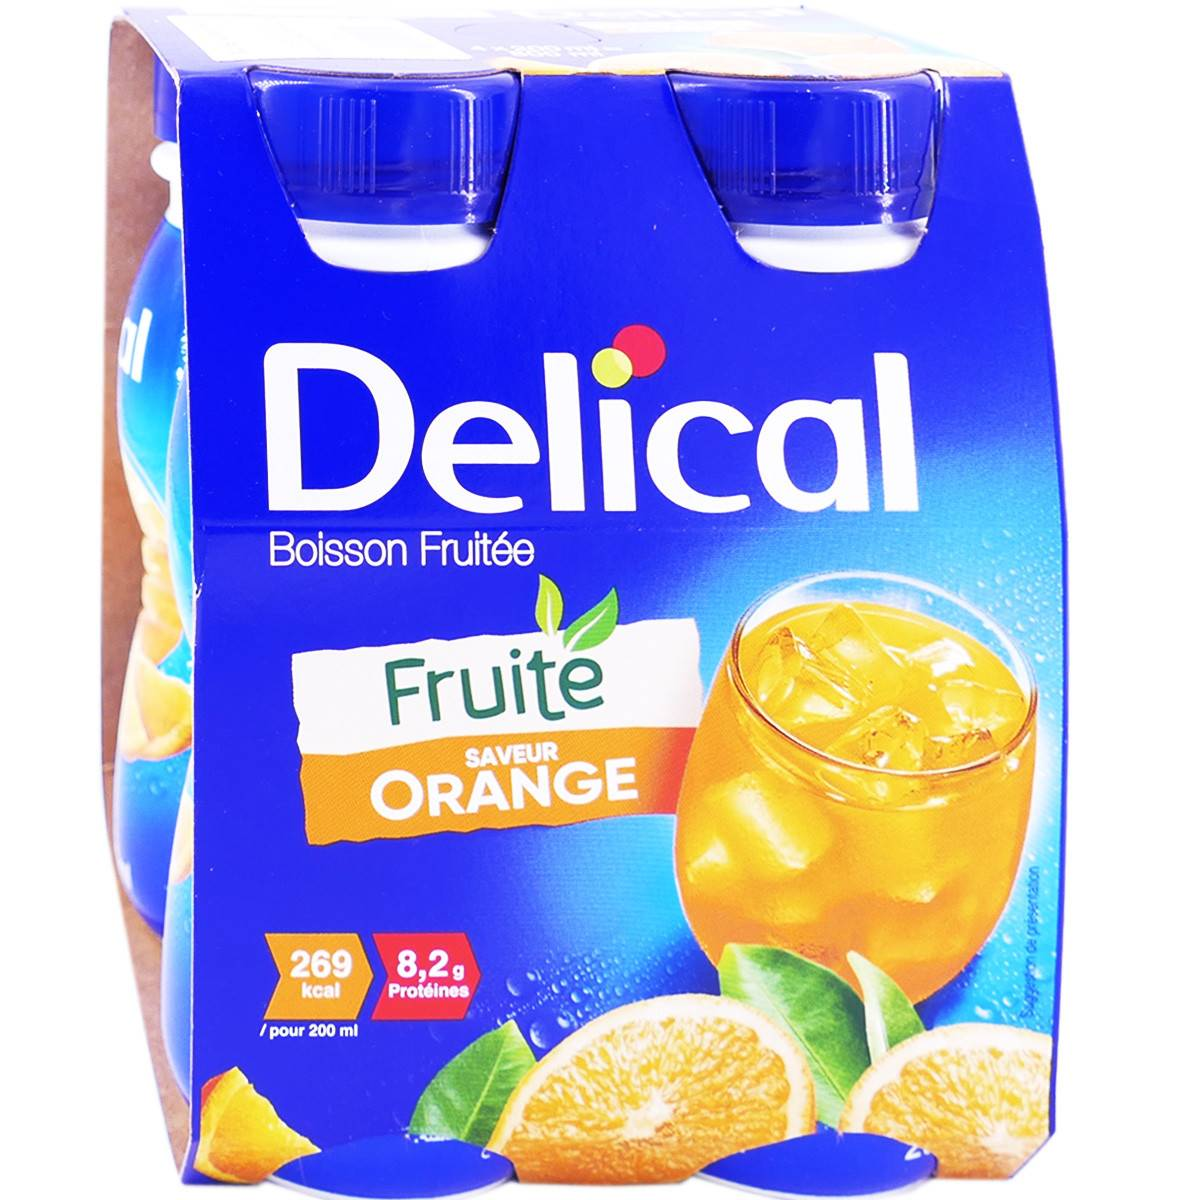 DIVERS Delical boisson fruitee orange 4x200 ml